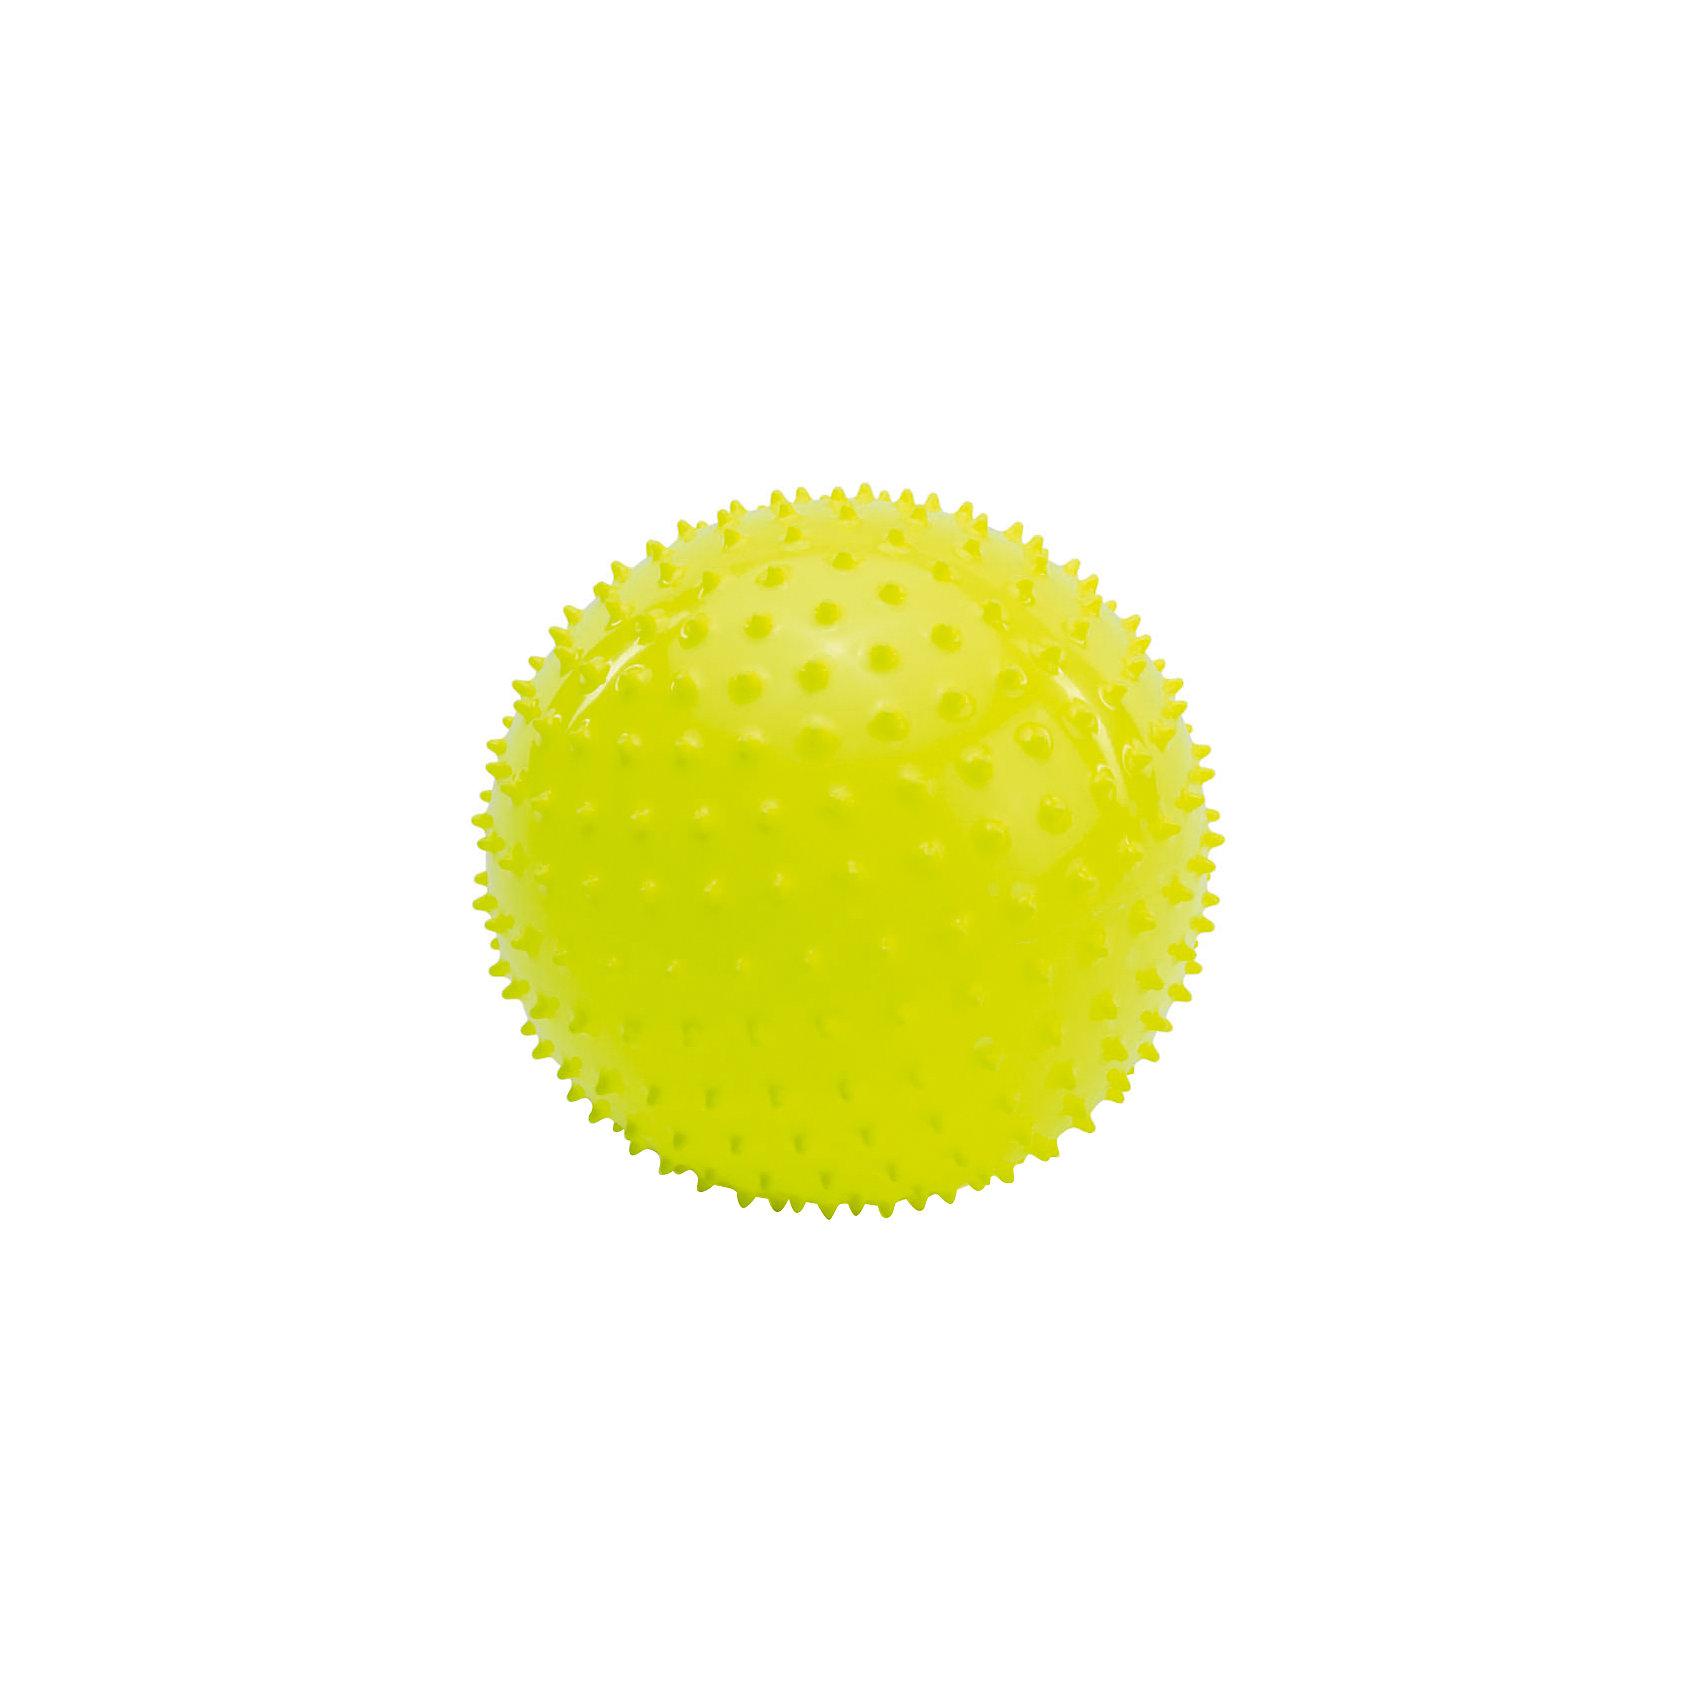 Pic'nMix Массажно-игровой мяч, 18 см, Pic'nMix